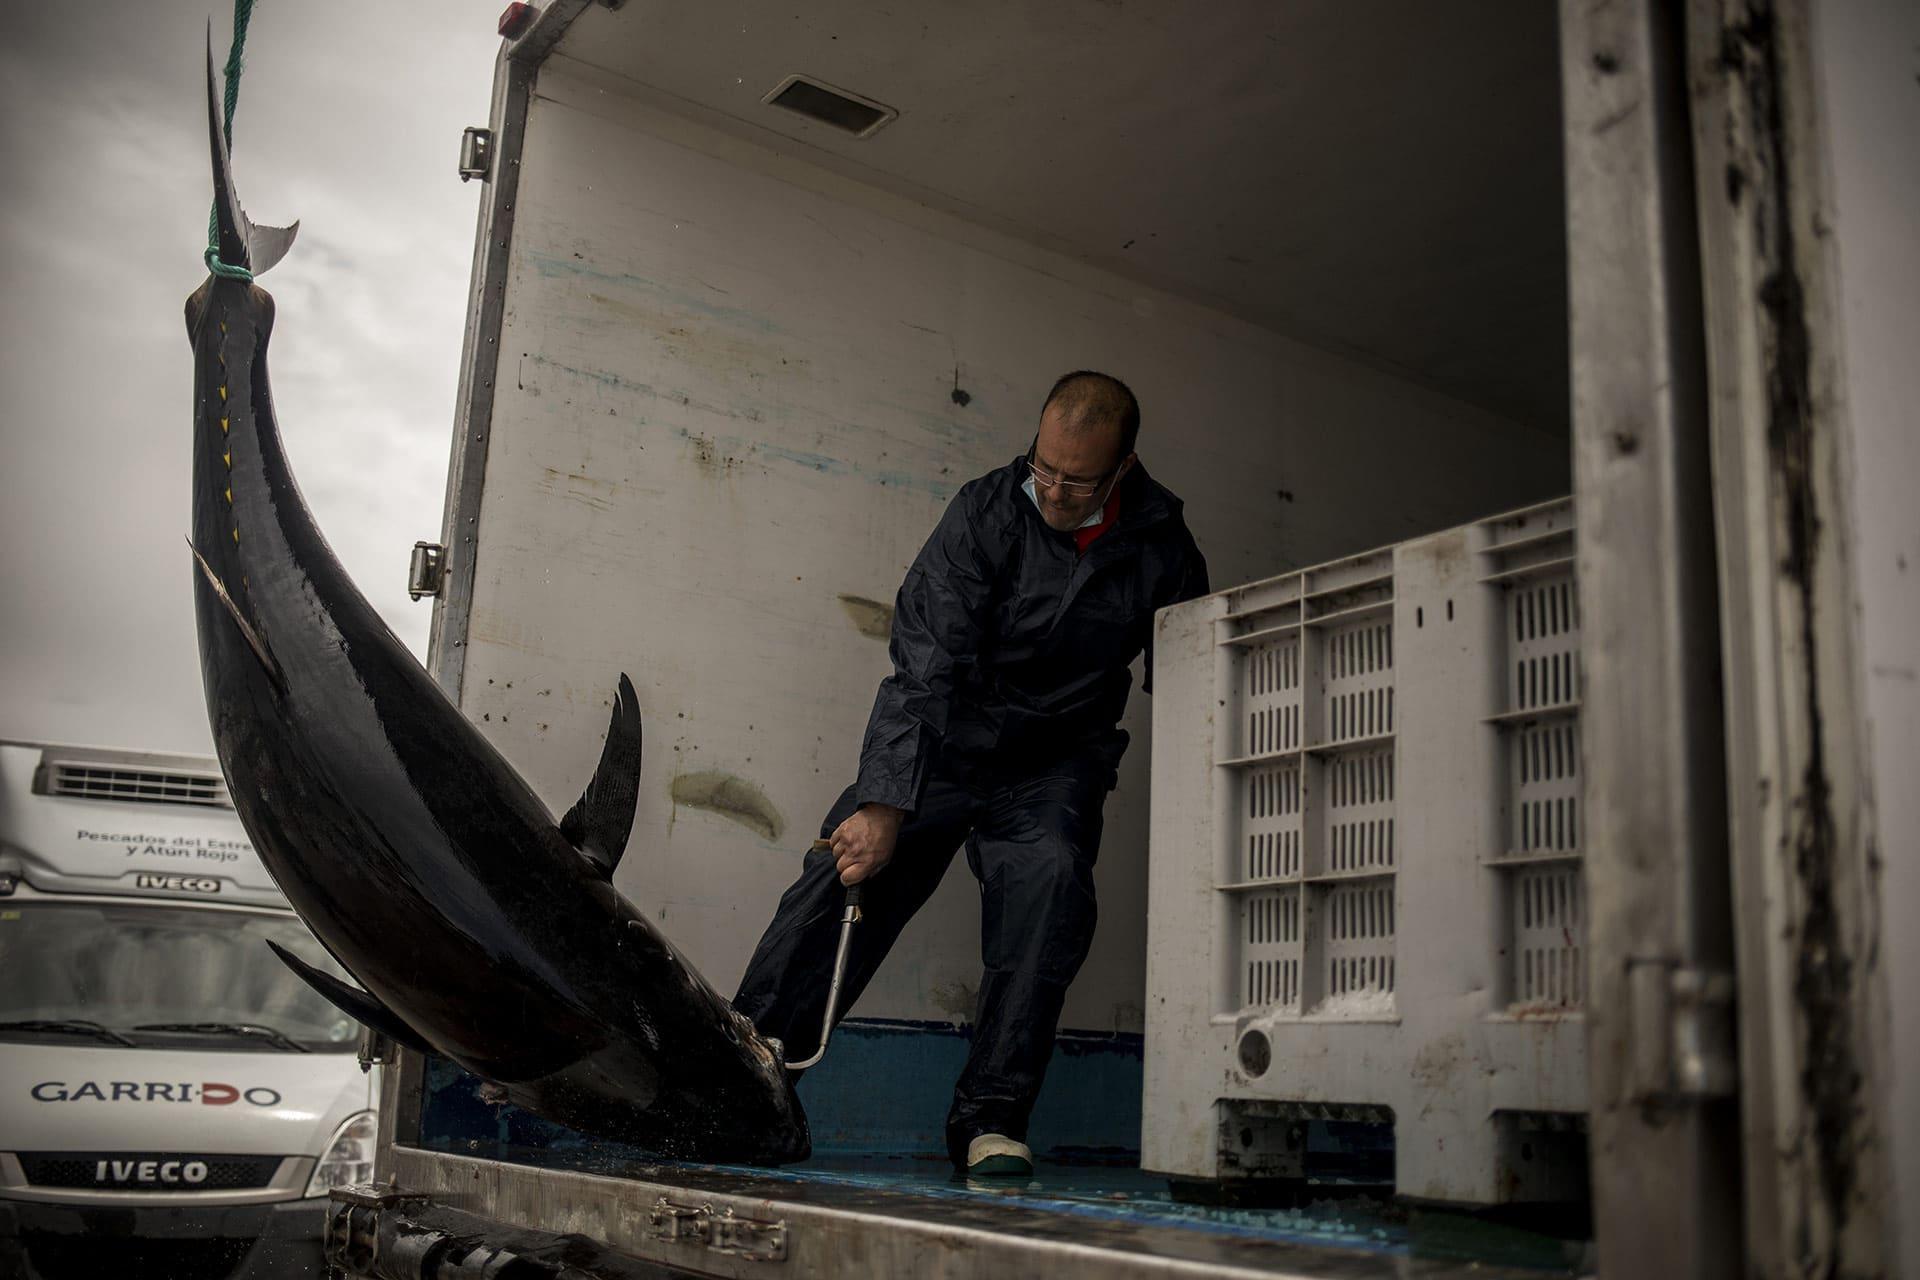 Fisherman loading a tuna on a truck